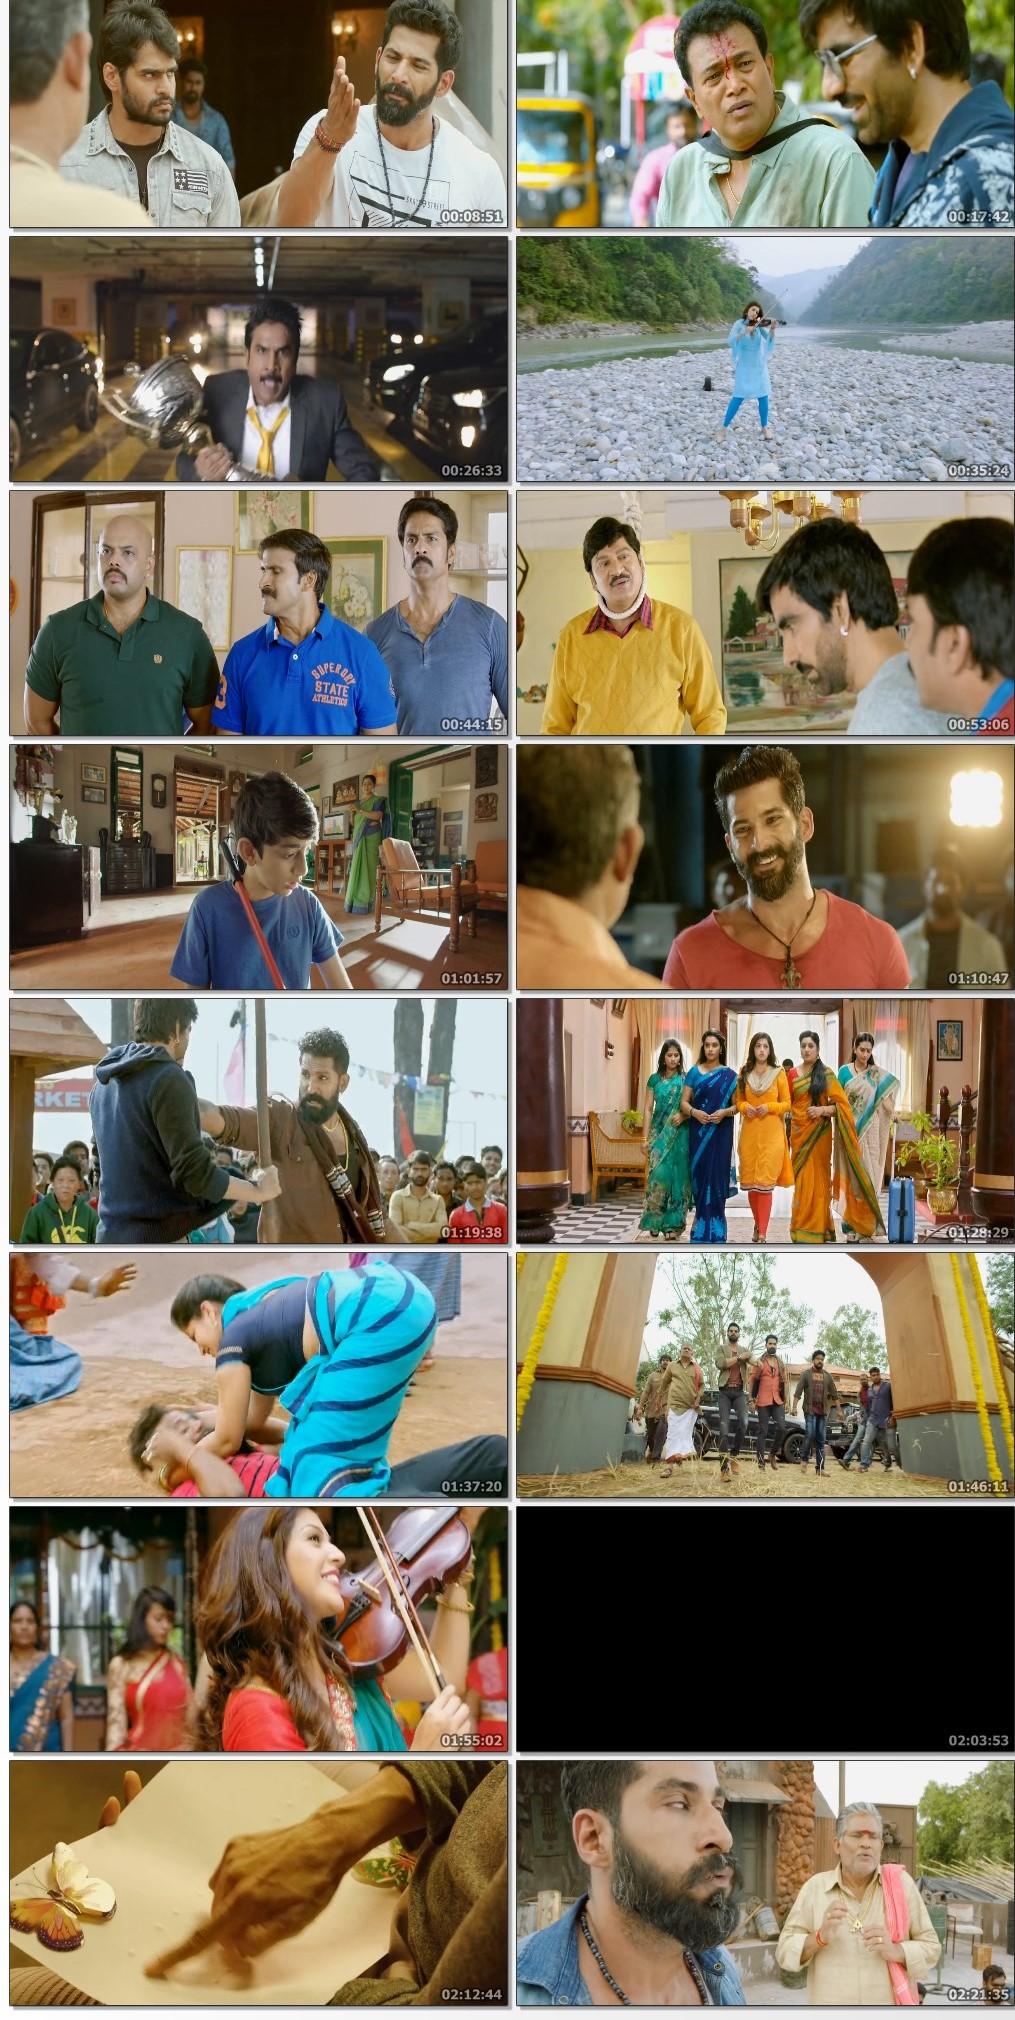 Raja-The-Great-2021-HQ-Hindi-Dubbed-720p-HDRip-ESub-1-4-GB-mkv-thumbs2bf343367c1753fe